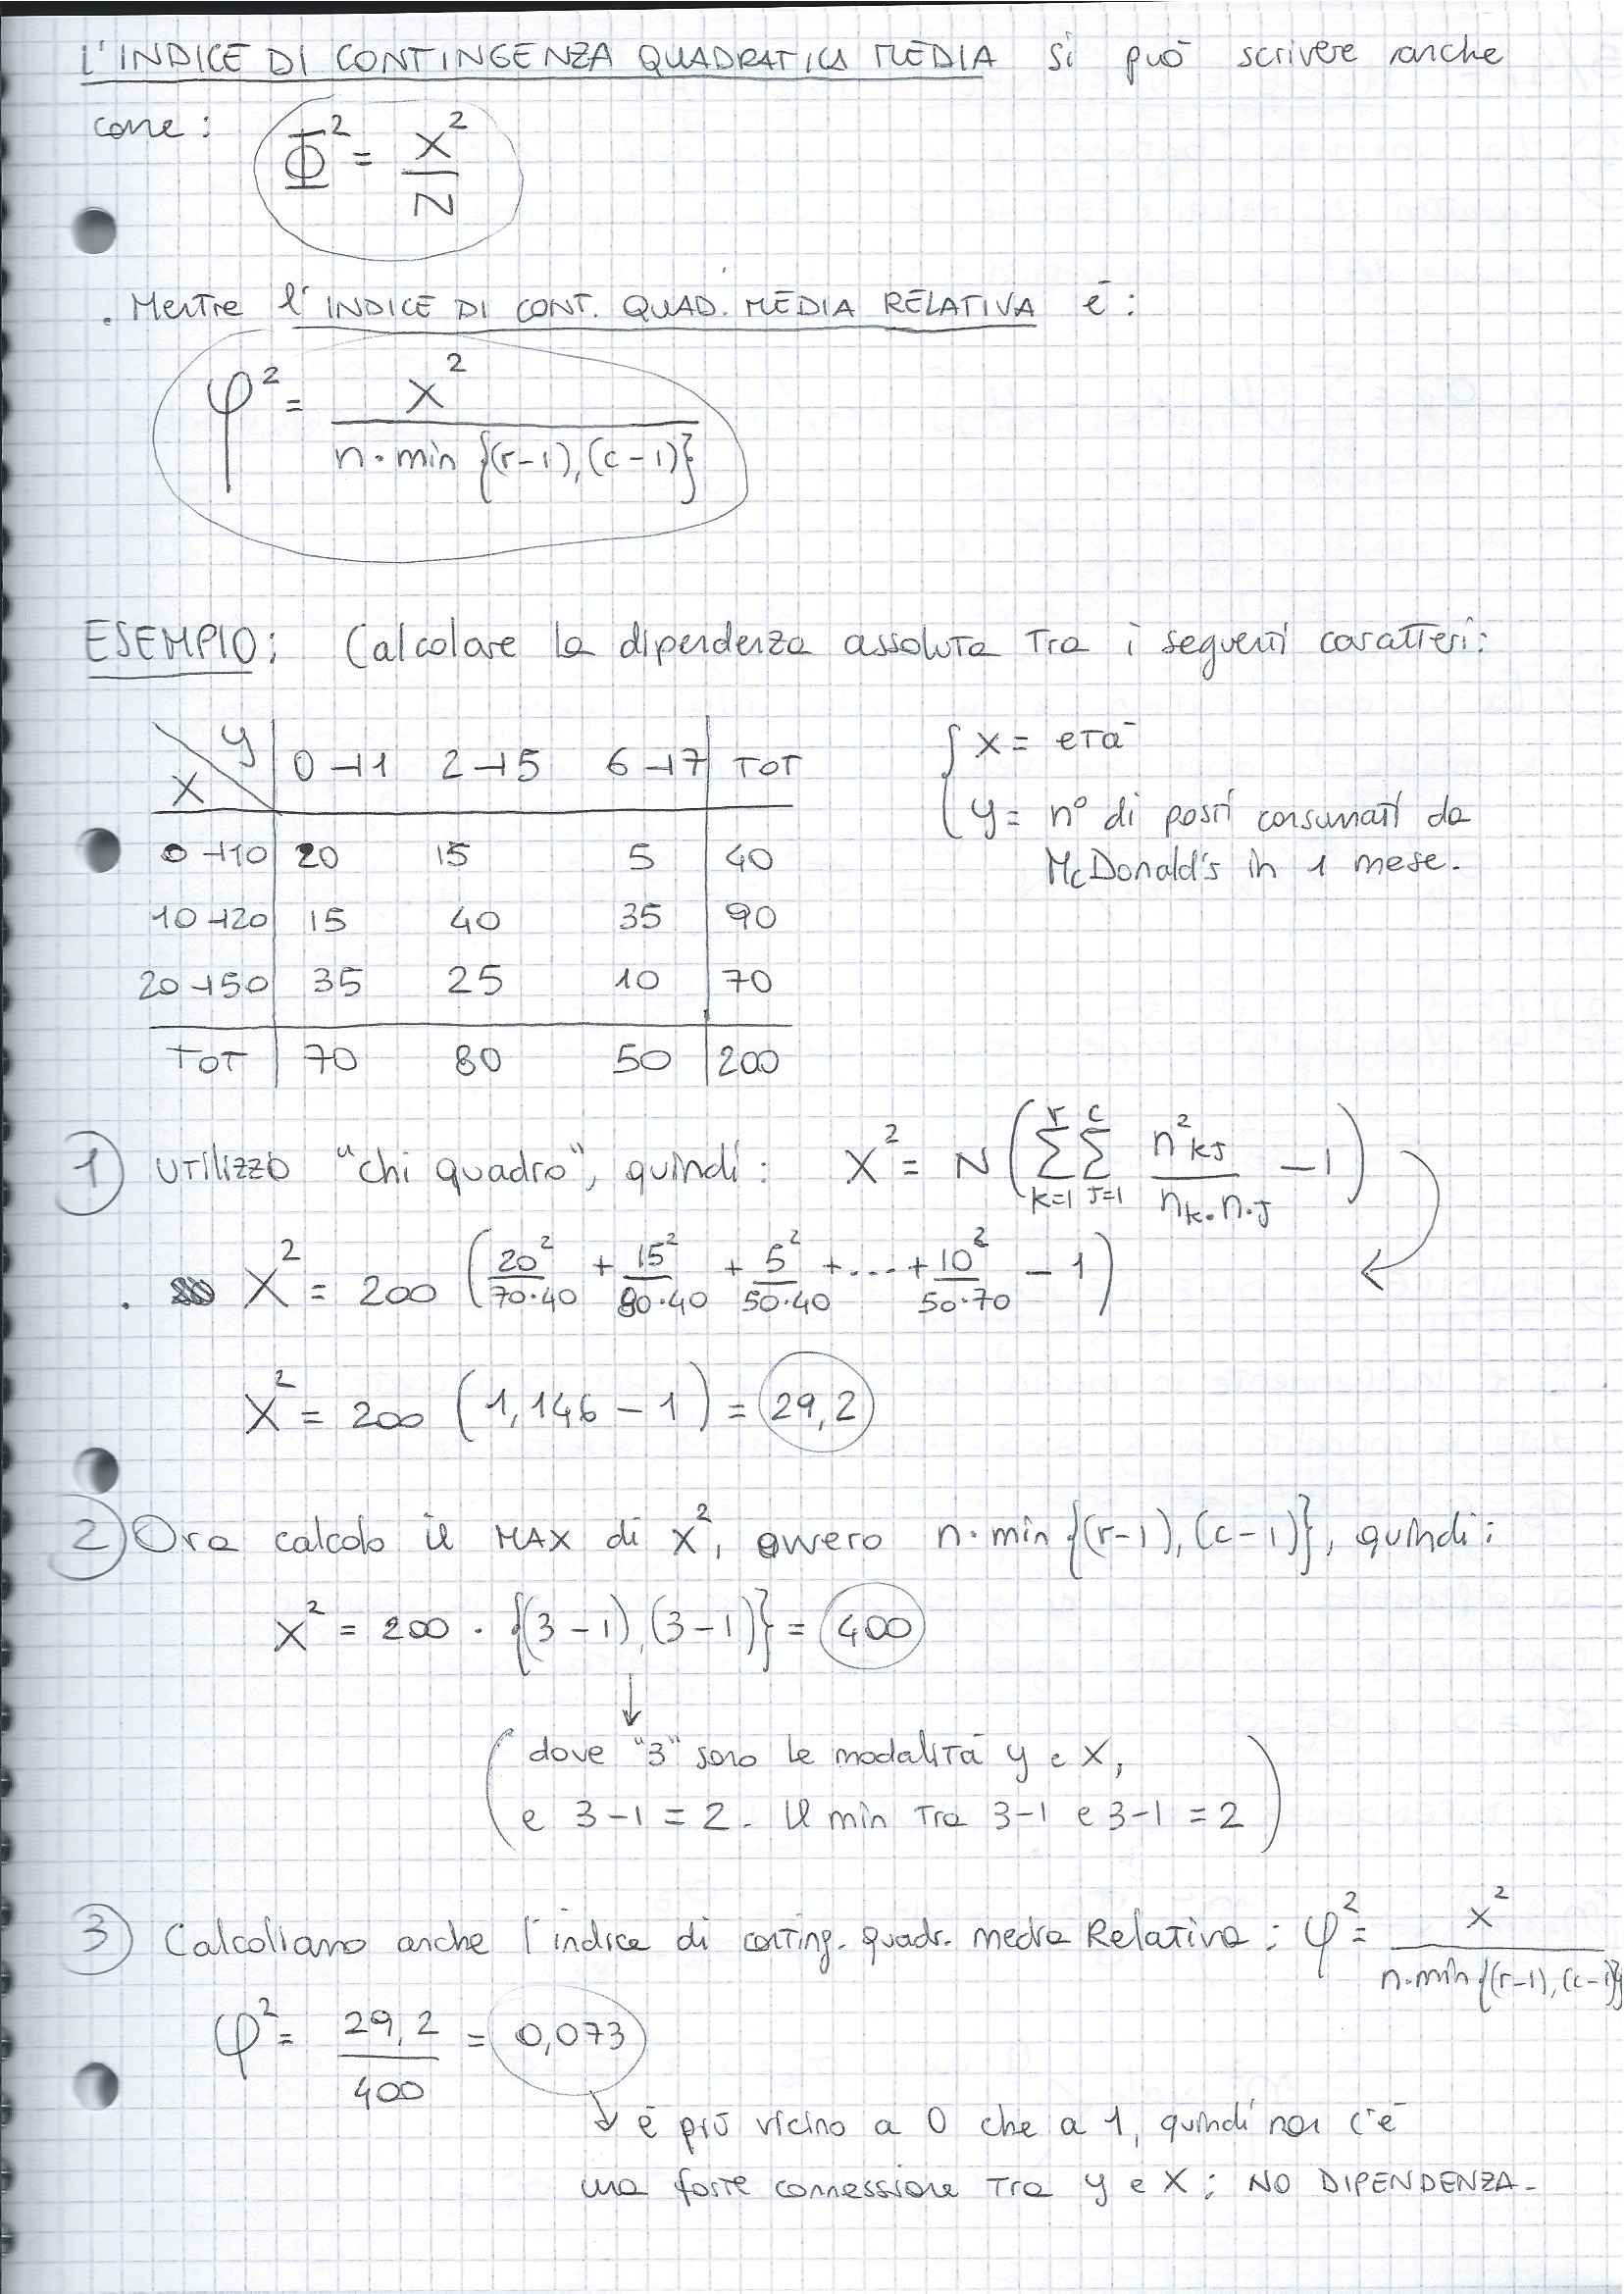 Statistica - Indice di contingenza quadratica media